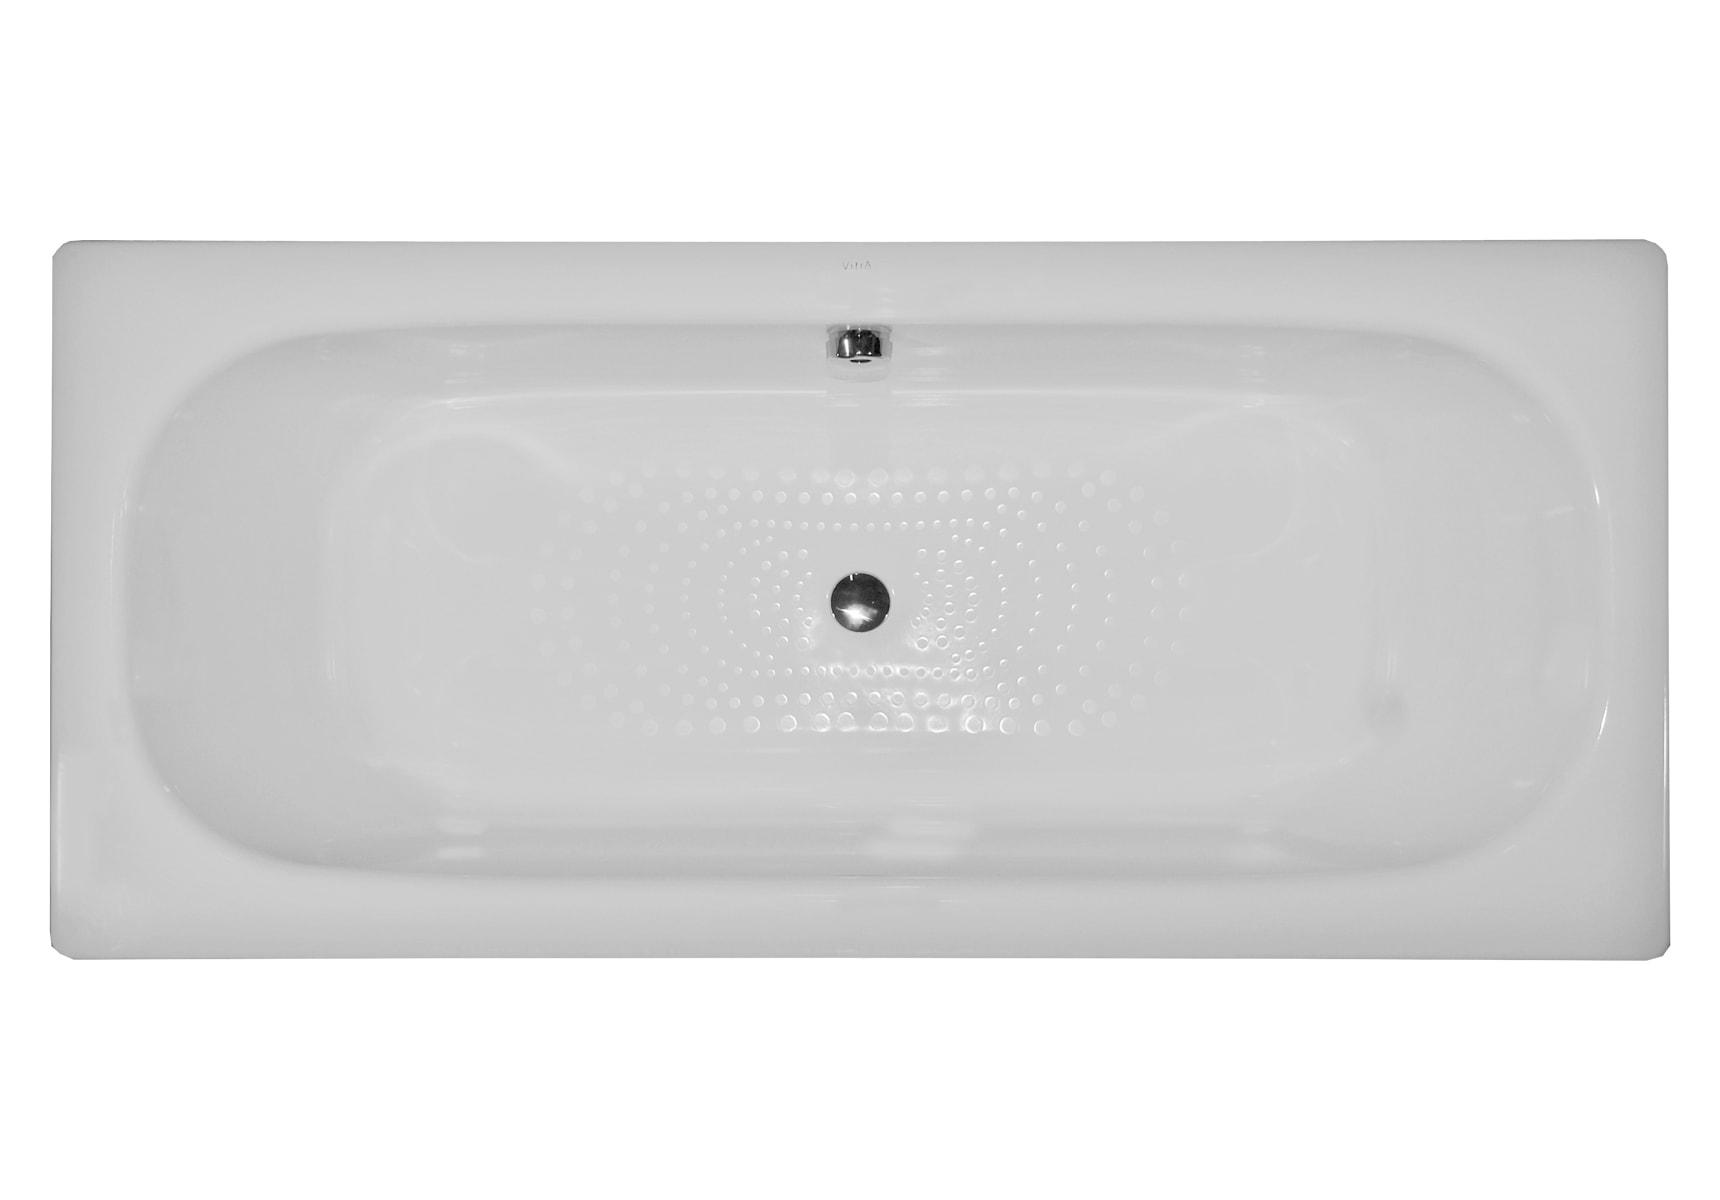 Generic Duo 170x70cm Steel Bathtub, 3.5mm, Sound Proofing Pad